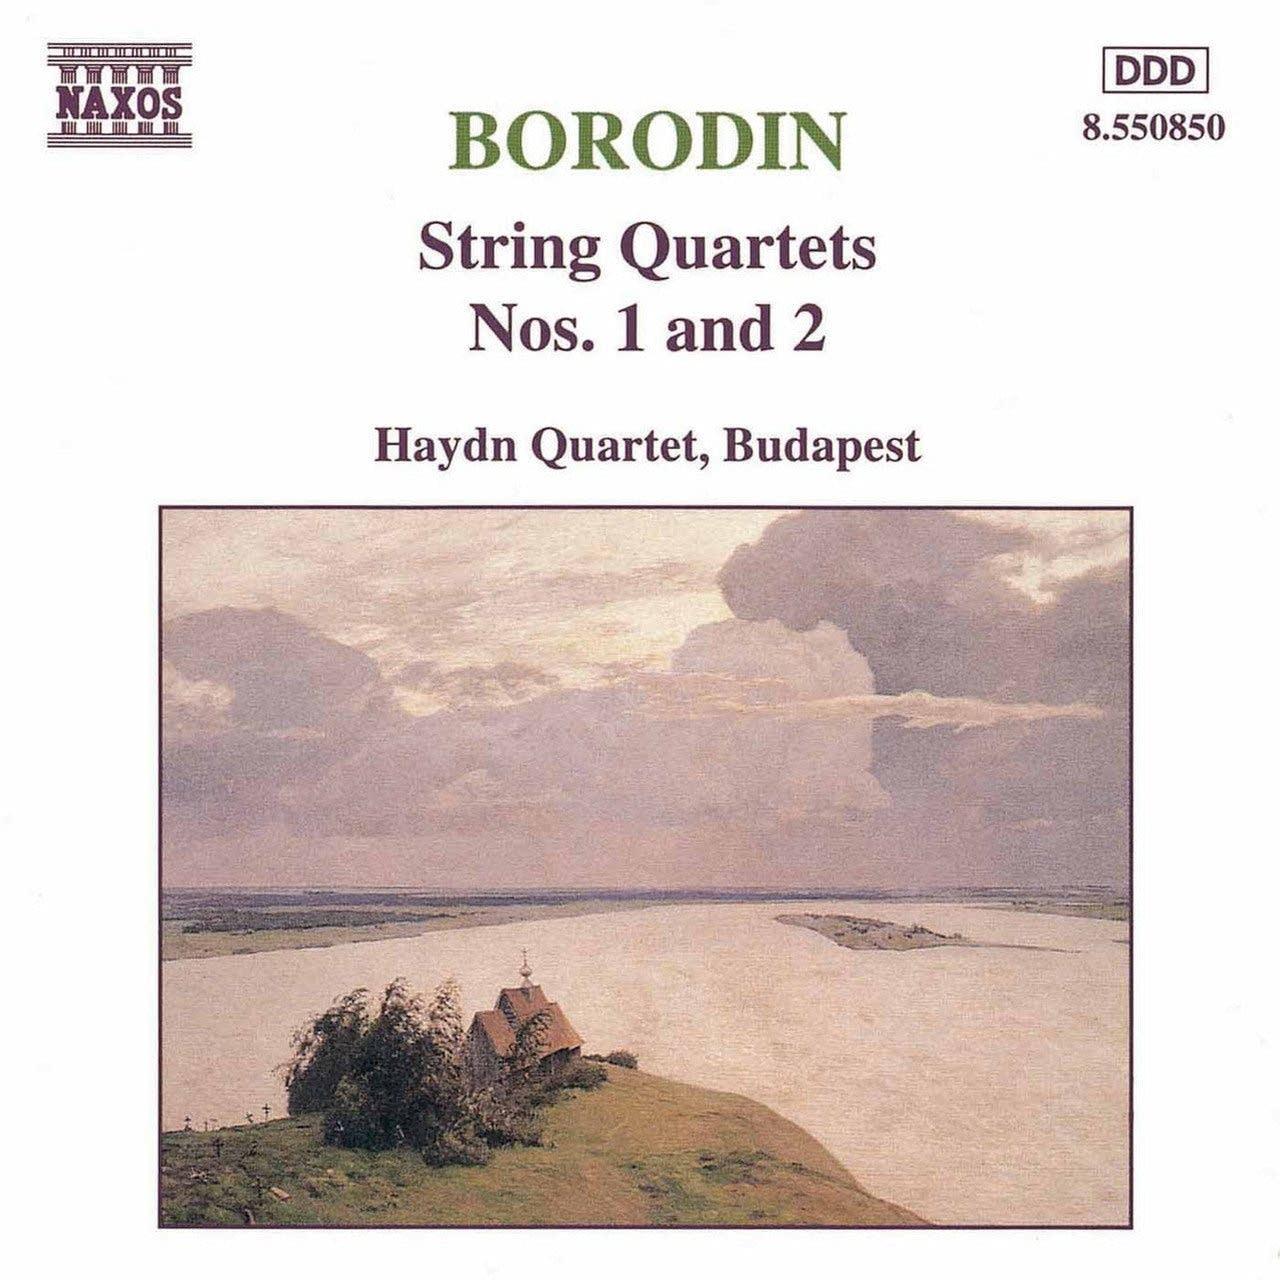 Alexander Borodin - String Quartet No. 2: Notturno